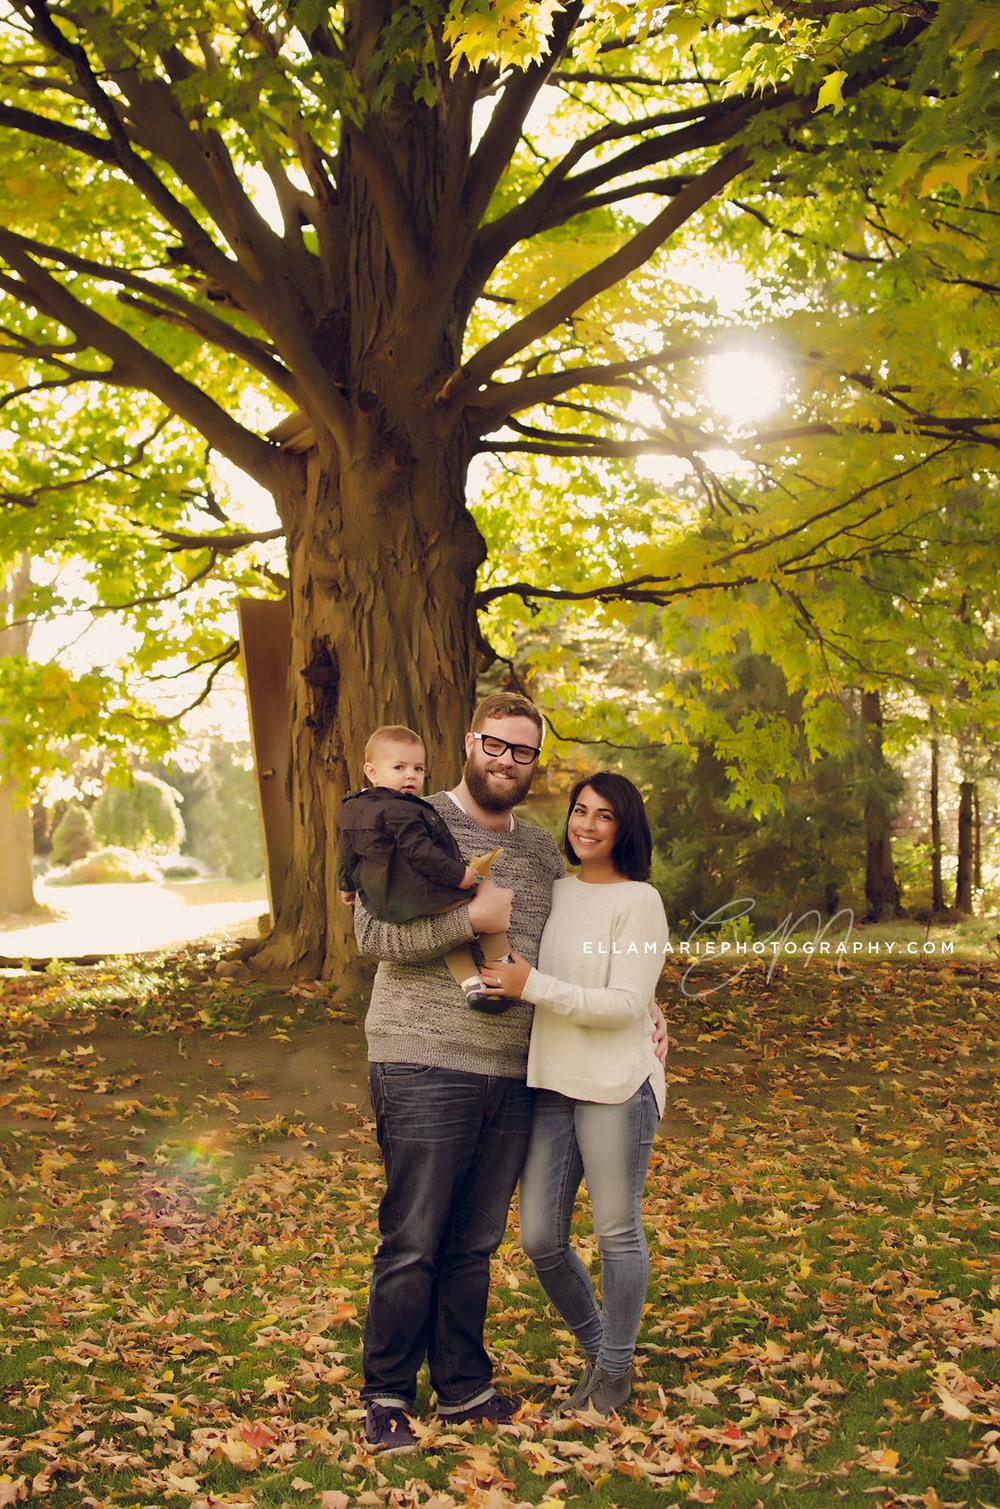 Erika_EllaMariePhotography_family_Baden_ON_New_Hamburg_Stratford_Waterloo_Kitchener_Guelph_Cambridge_Listowel_photographer_photography_01.jpg